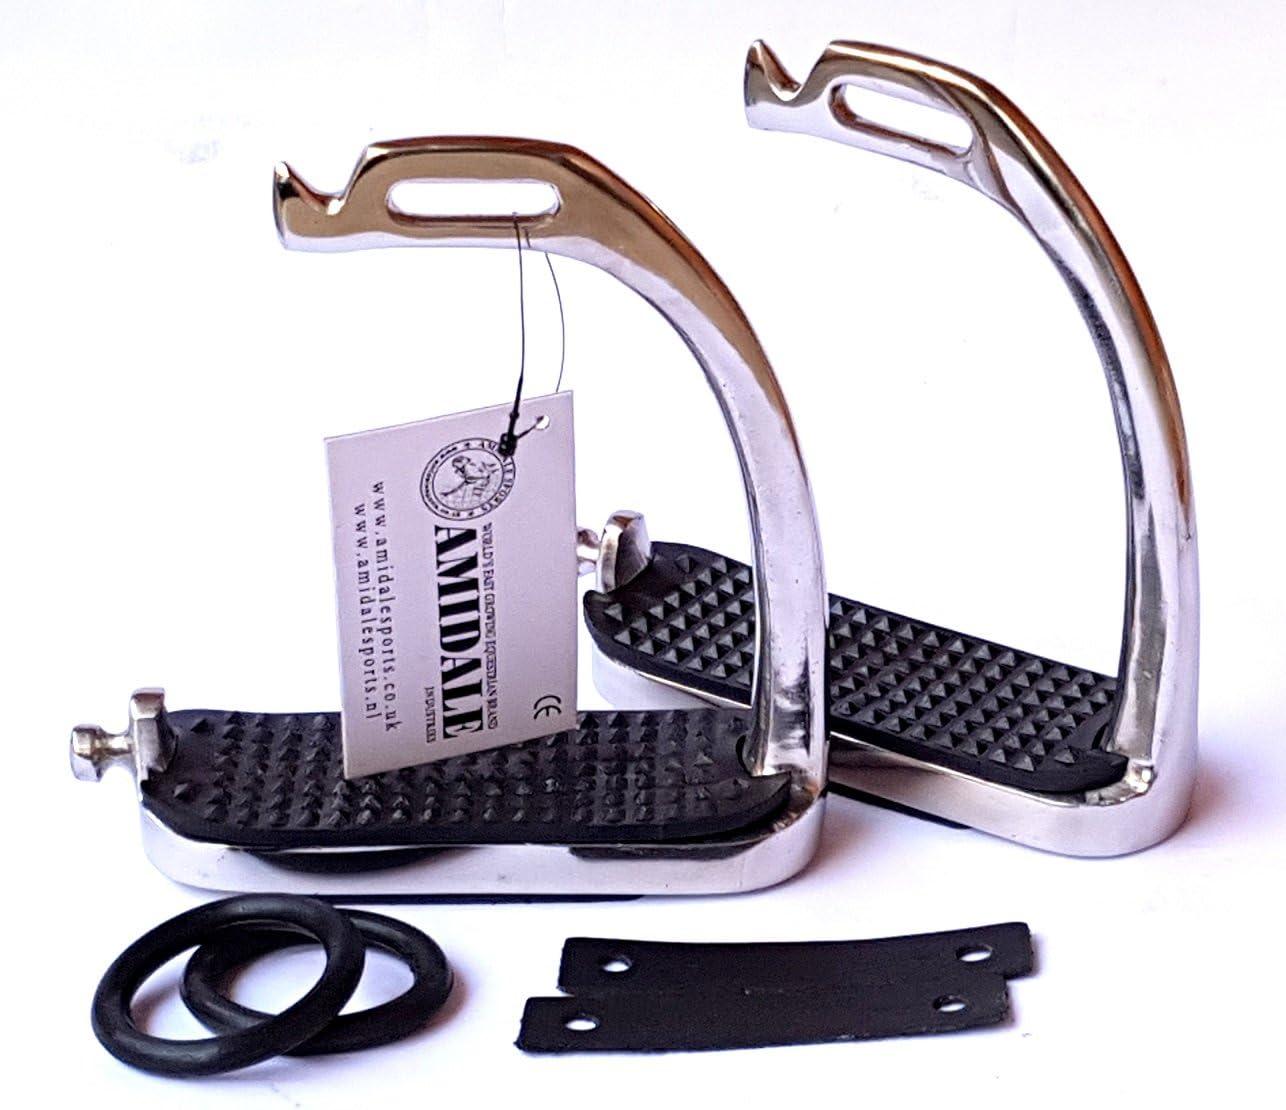 4.75 inch Peacock Stirrups Horse Equestrian Safety Iron FILLIS Stirrups